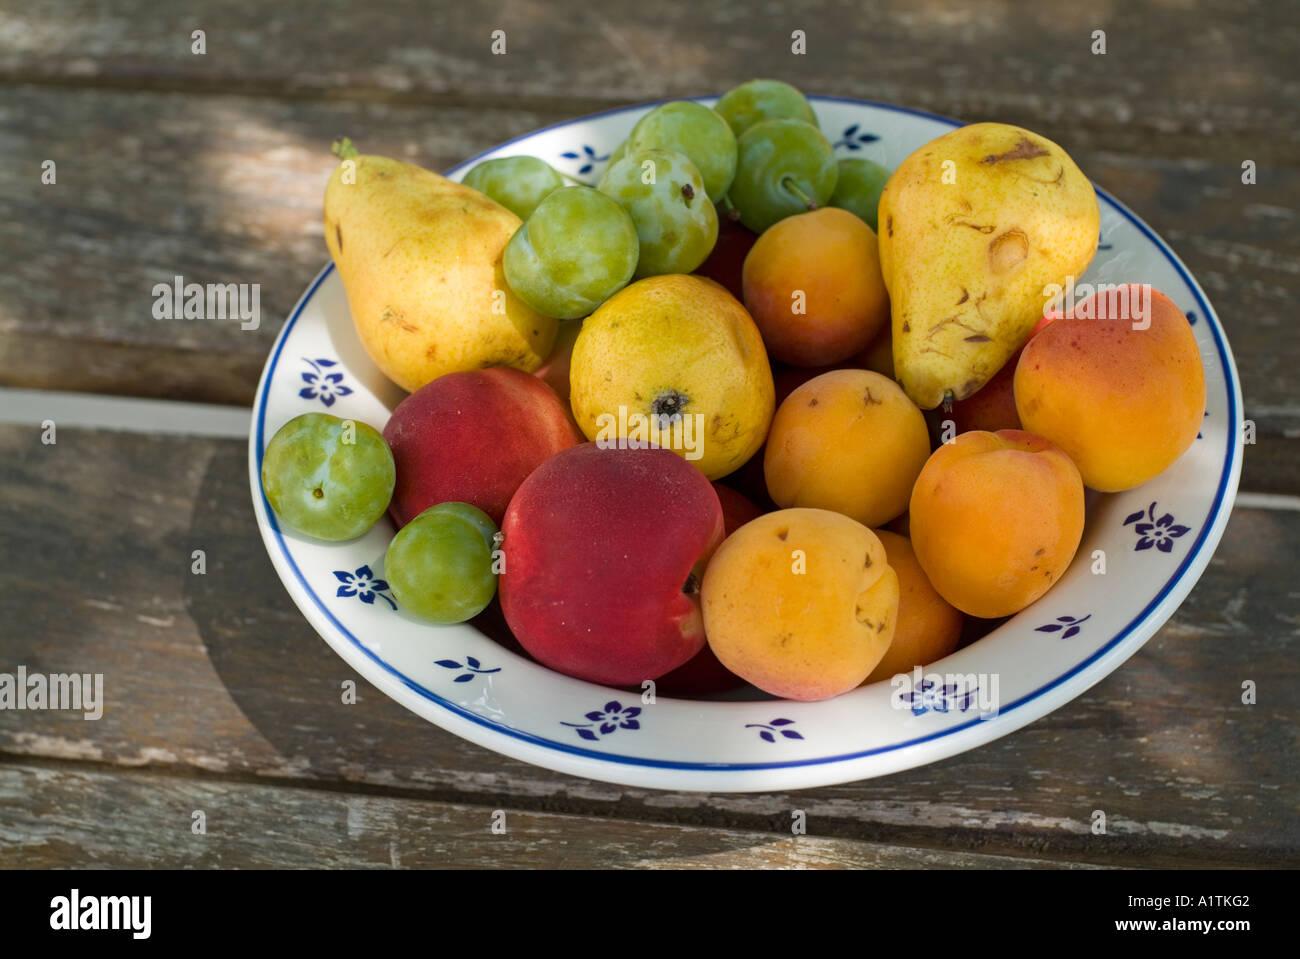 Bowl of fruit - Stock Image